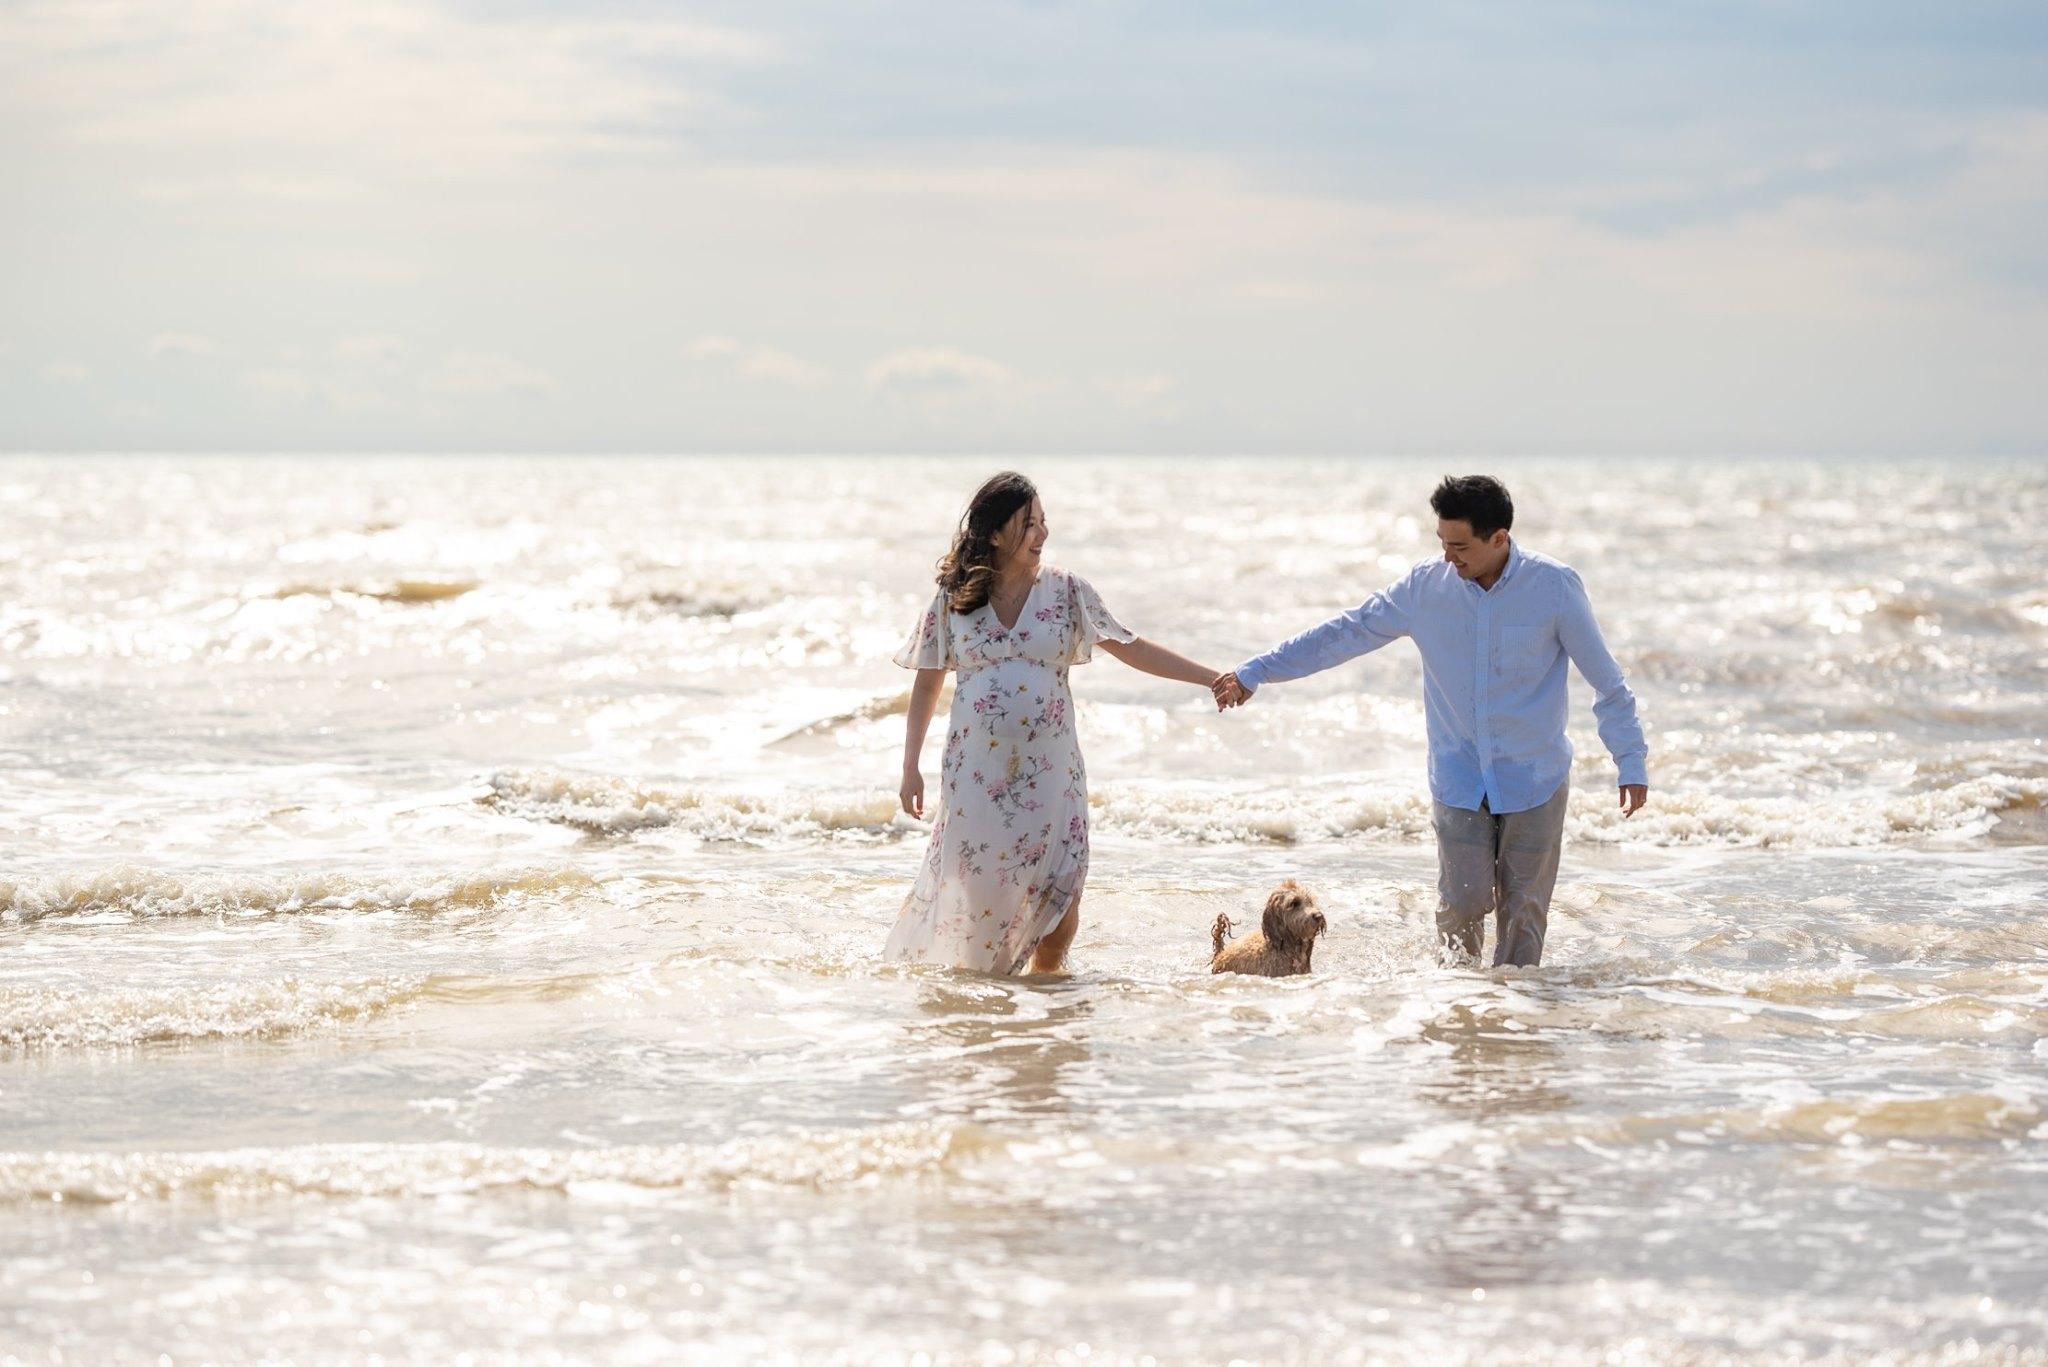 dougal photography, family photography, beach photography, inspiration photography, camber sands photography